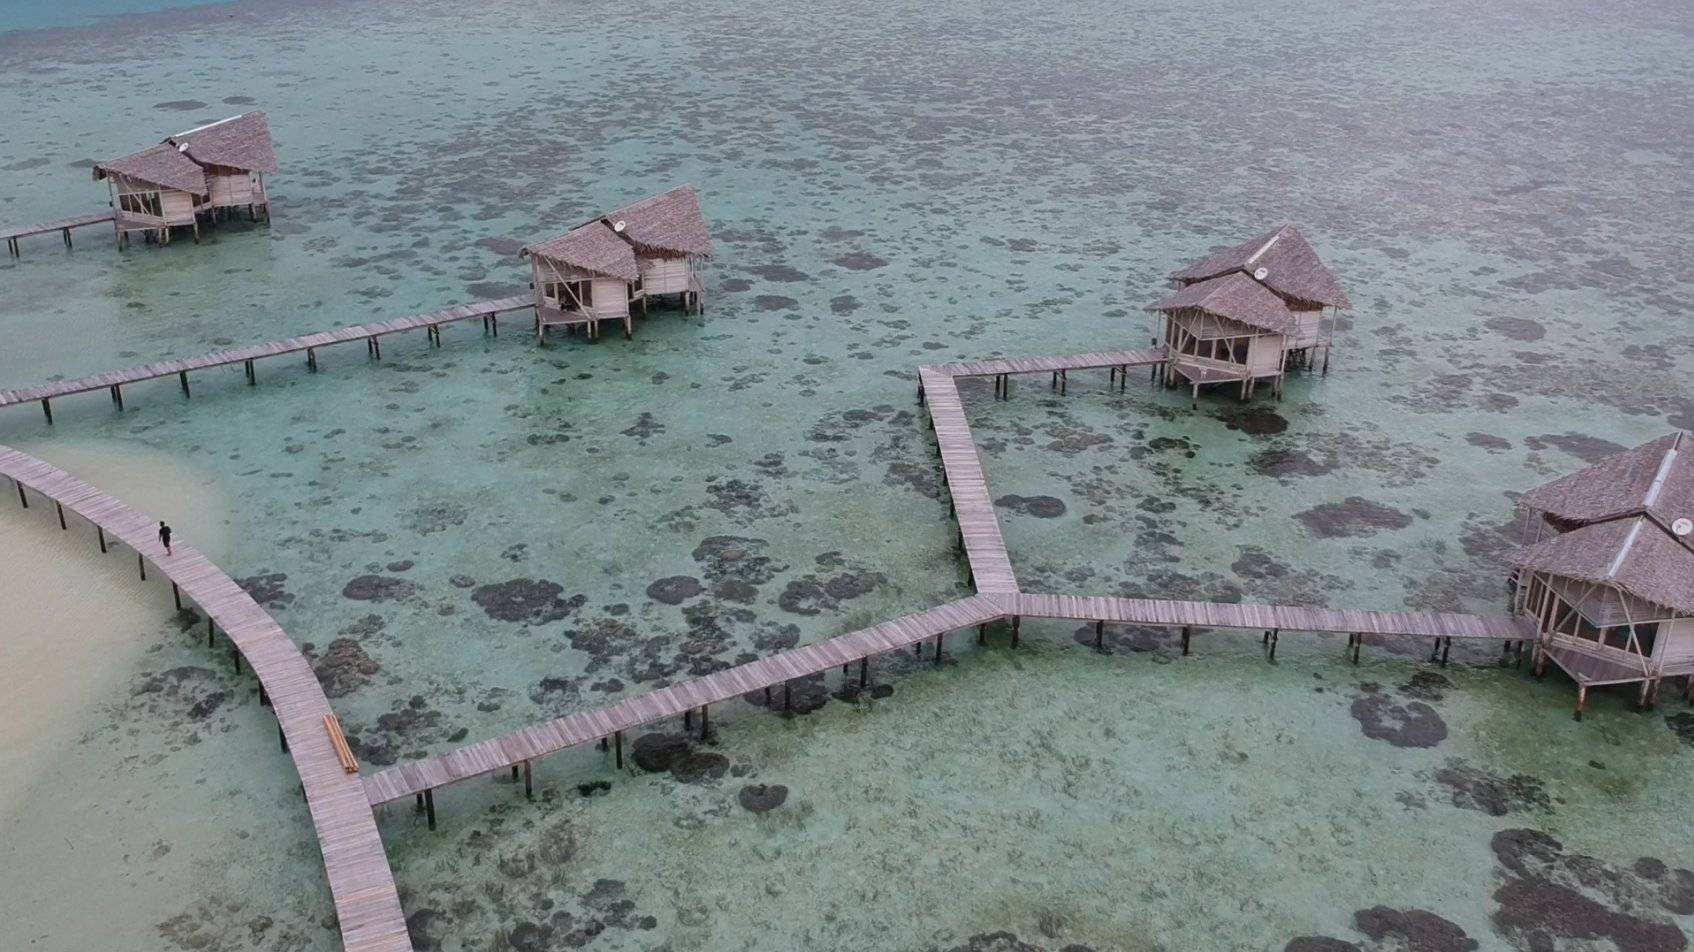 Photo 1: Pulo Cinta, un endroit merveilleusement romantique